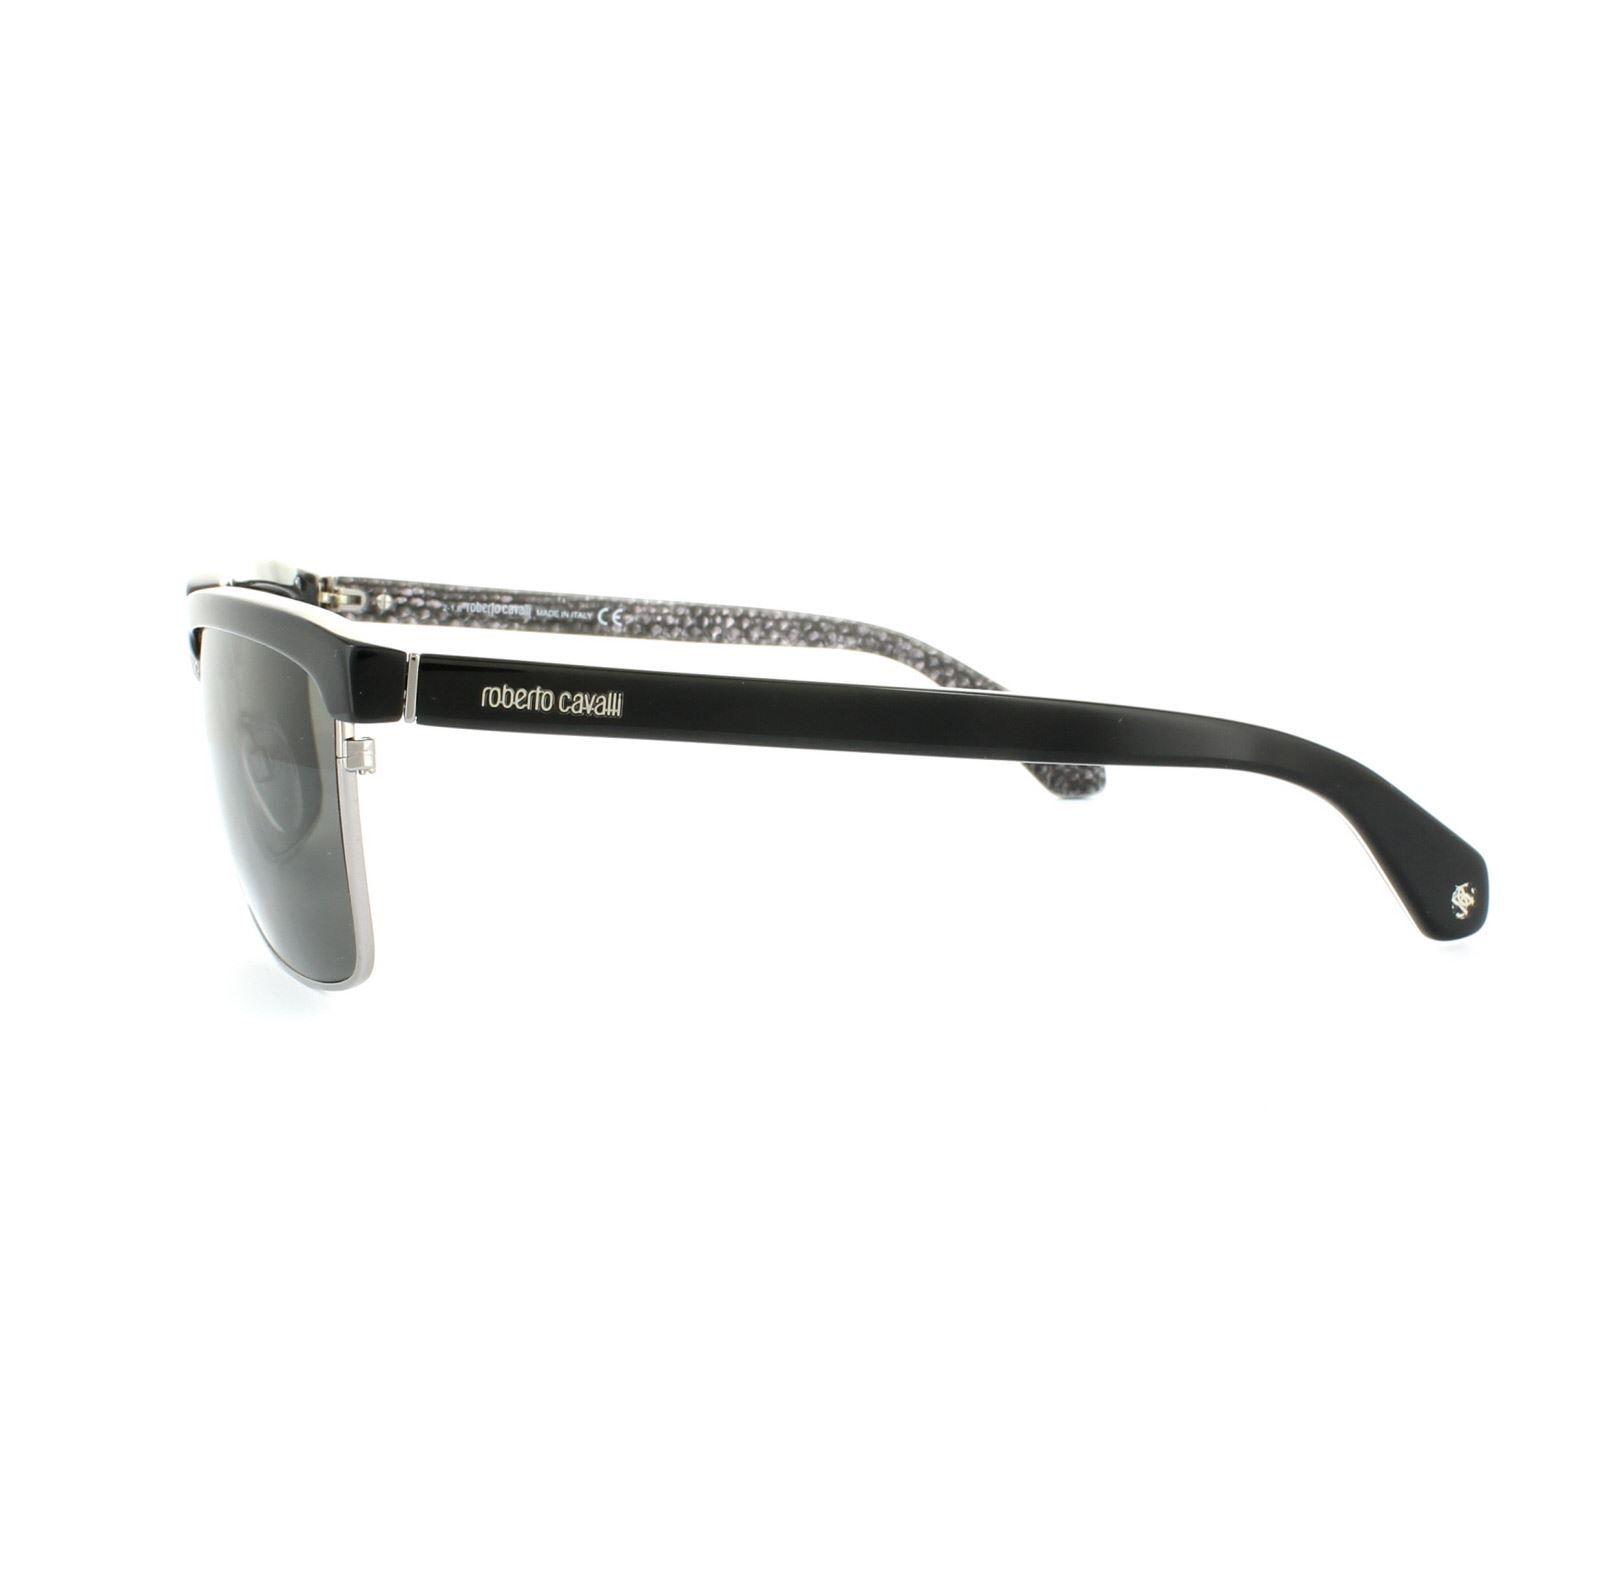 Roberto Cavalli Sunglasses 836S 02V Matt Black Grey Blue